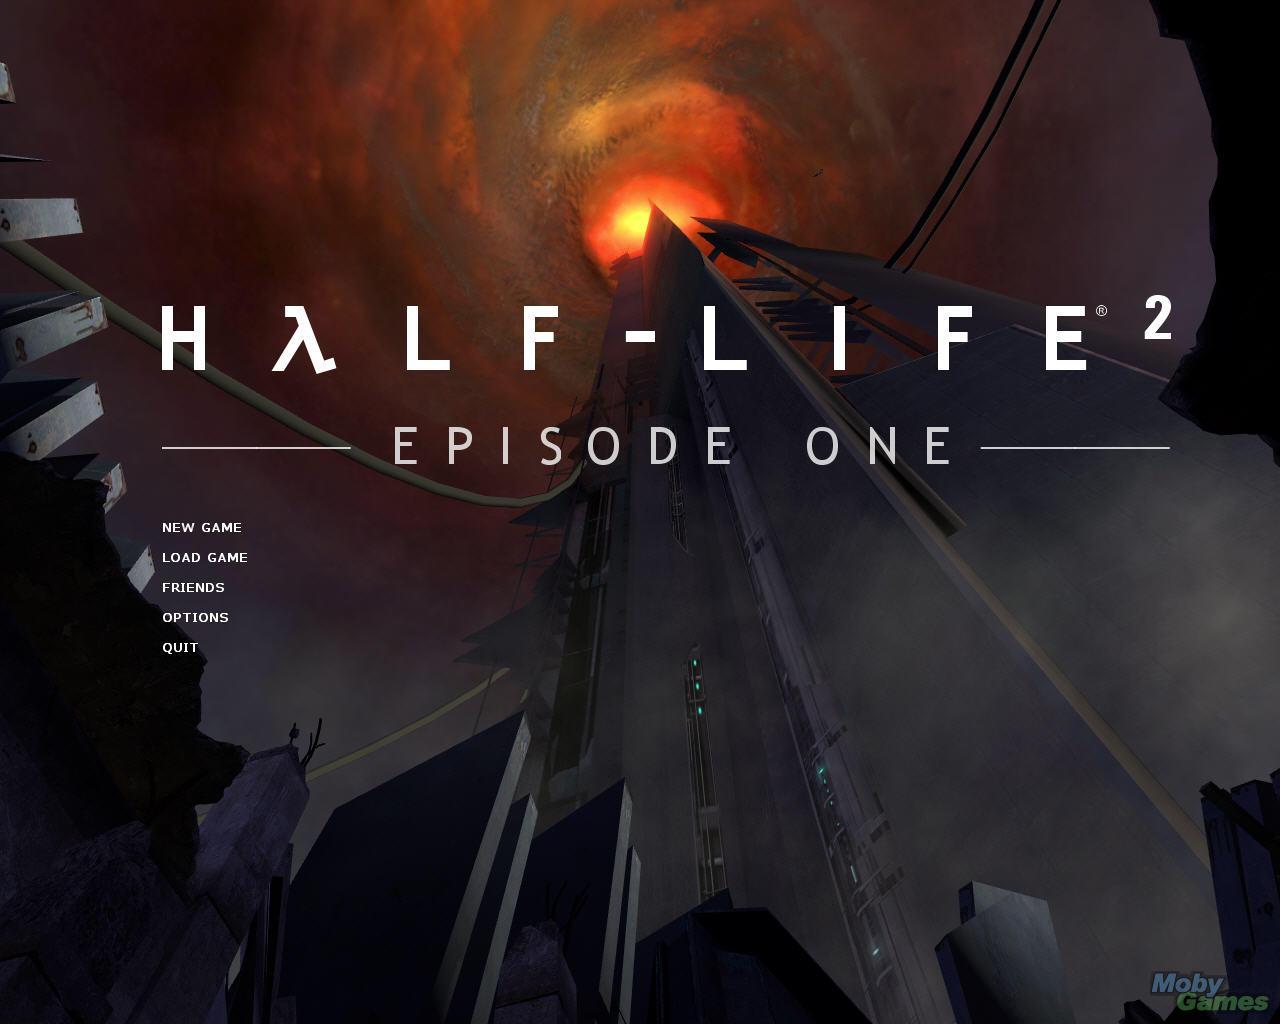 half life 2 episode 1 free download full version pc